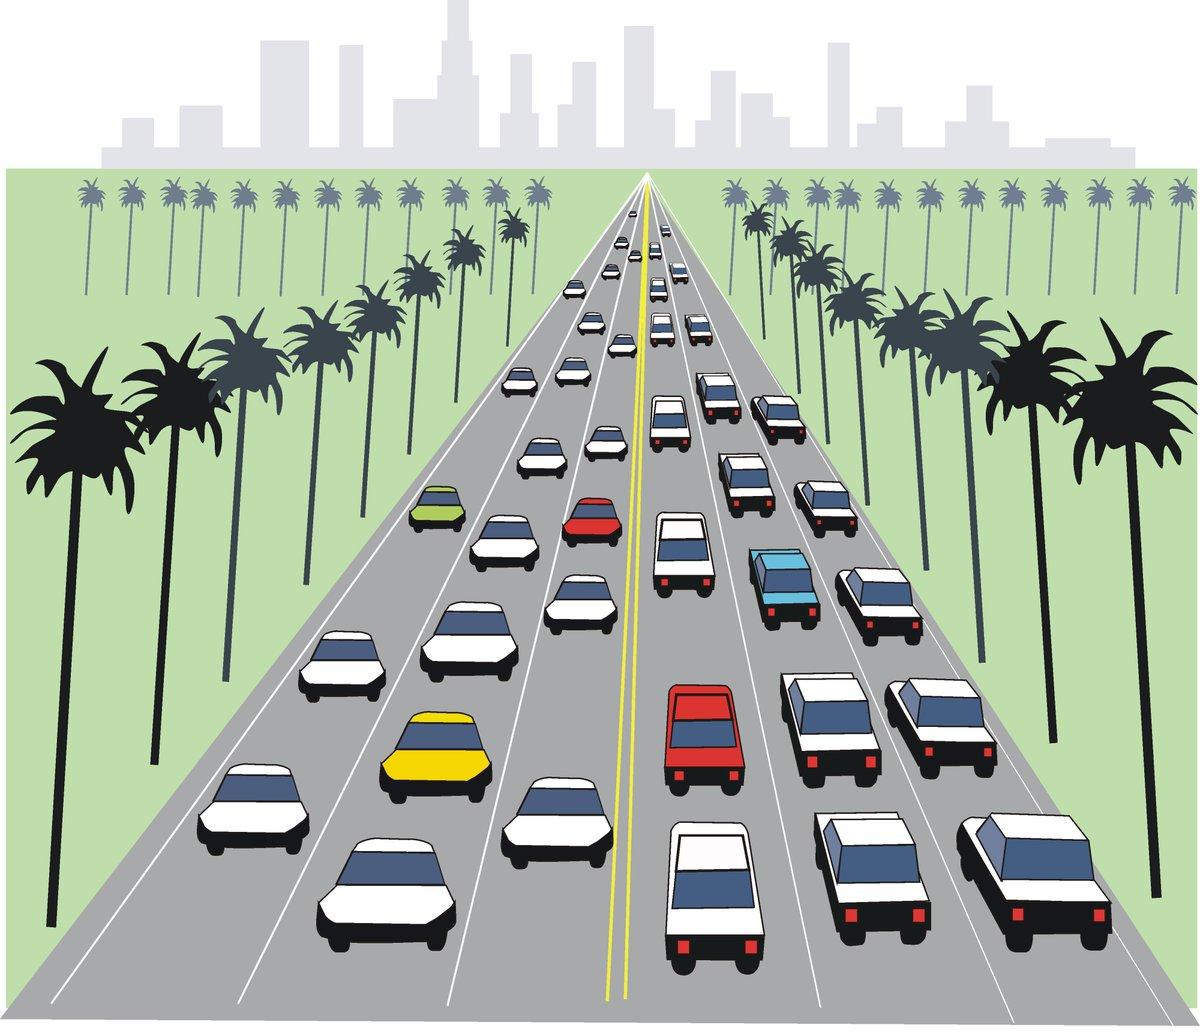 150,000 green jobs, zero waste, less gridlock: LA's plan to go from sprawl to sustainability http://t.co/TIvOpQAdis http://t.co/OMR3reV1Pk